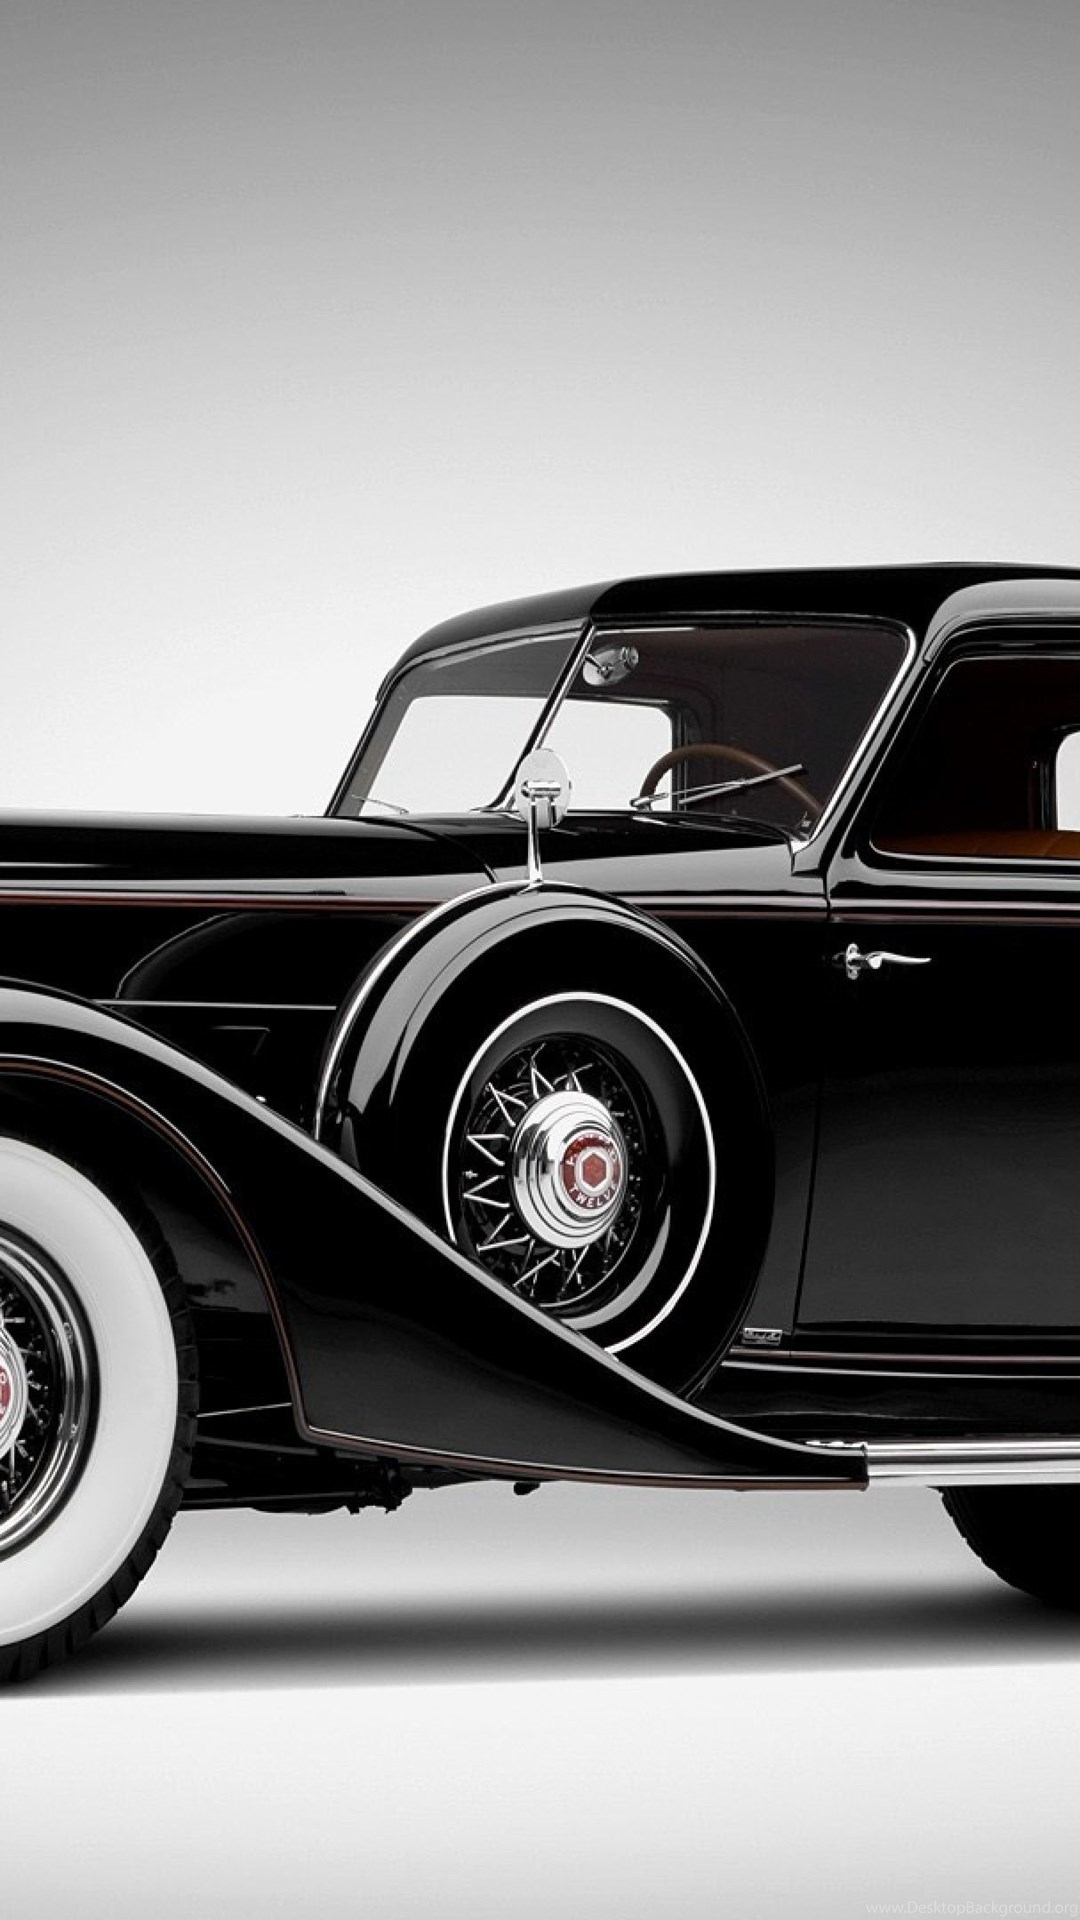 4K Ultra HD Classic Car Wallpapers HD, Desktop Backgrounds ...